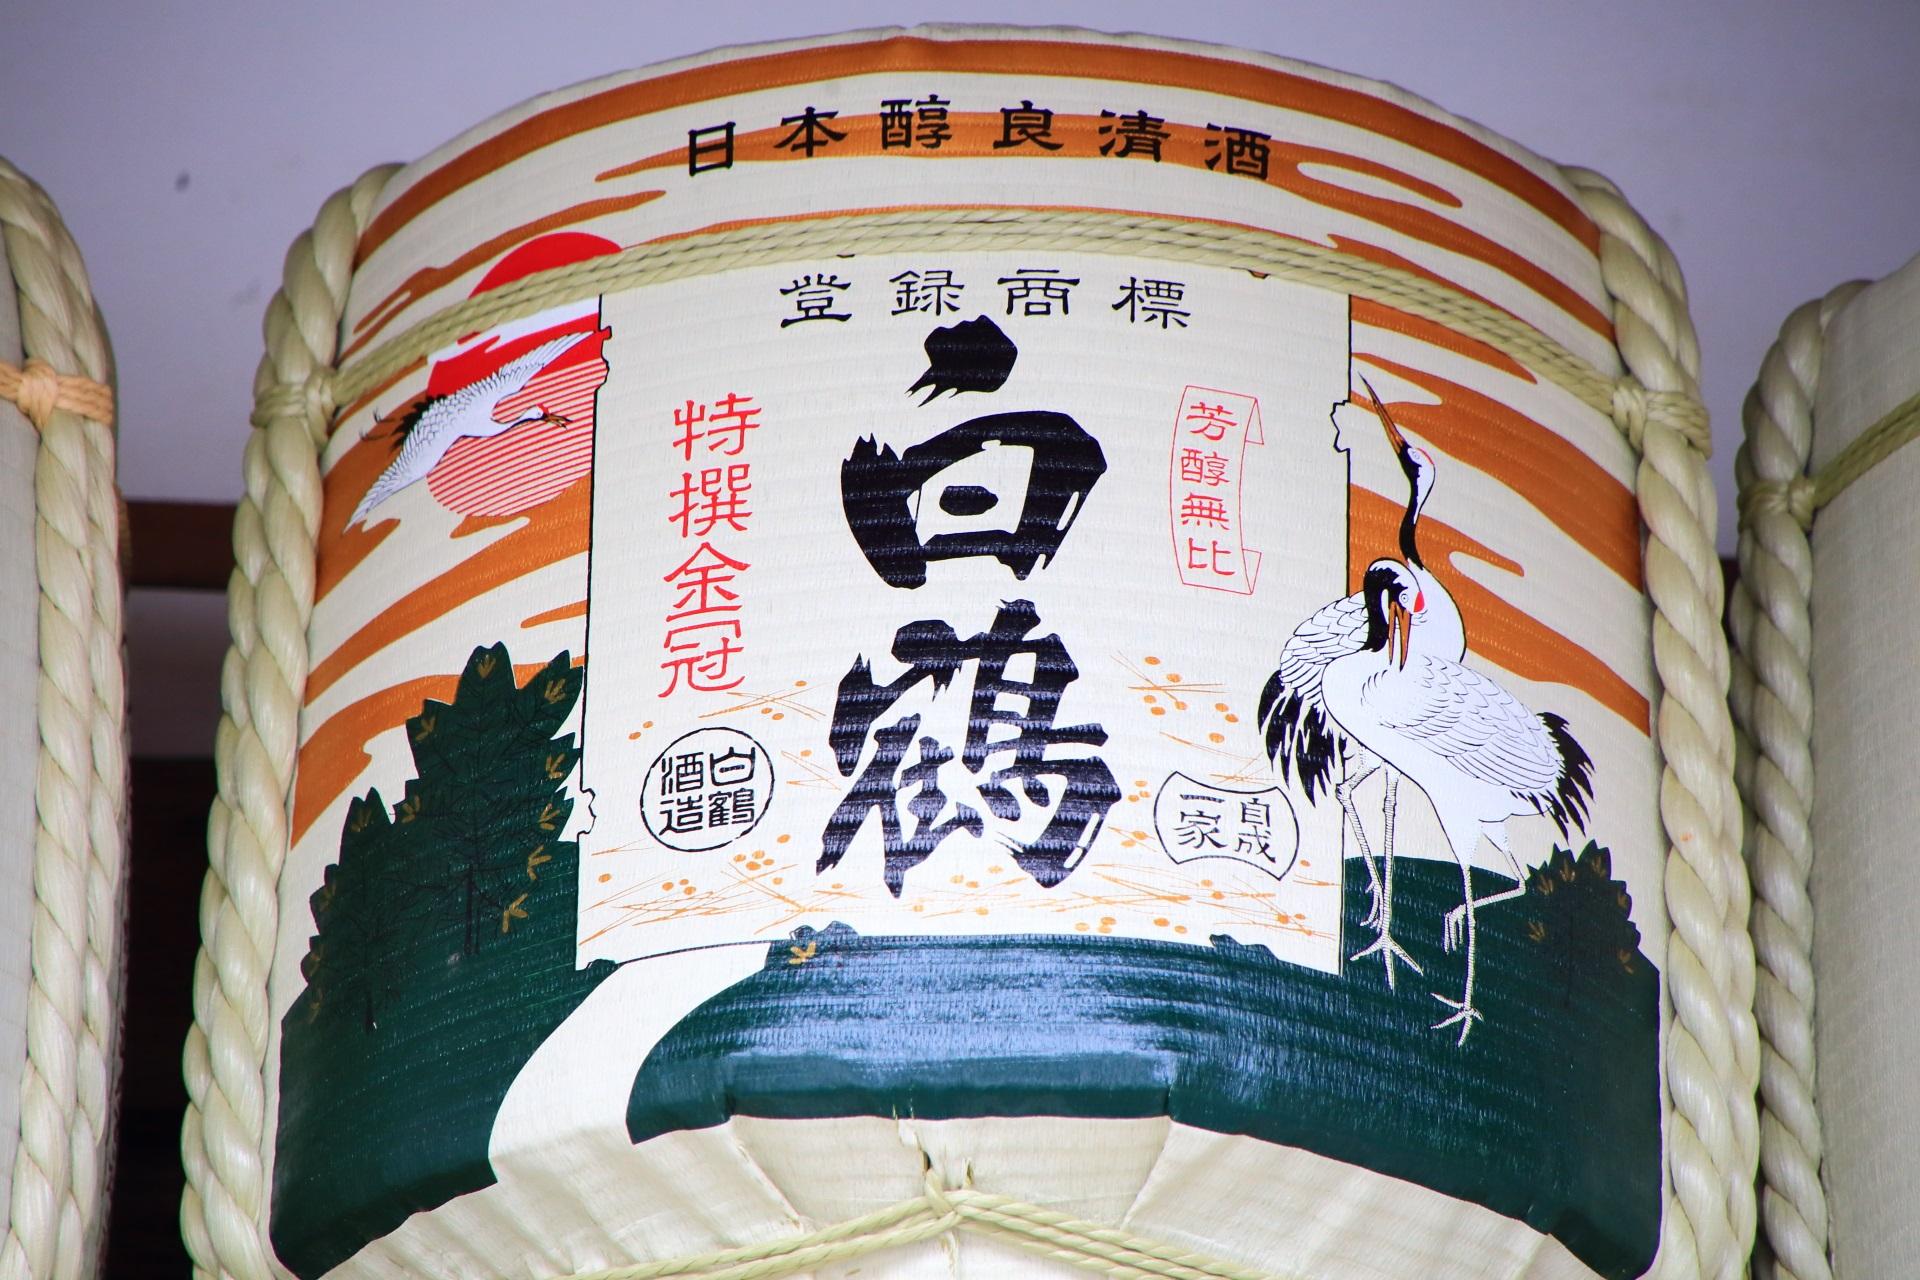 白鶴 酒樽 松尾大社 お酒の神様